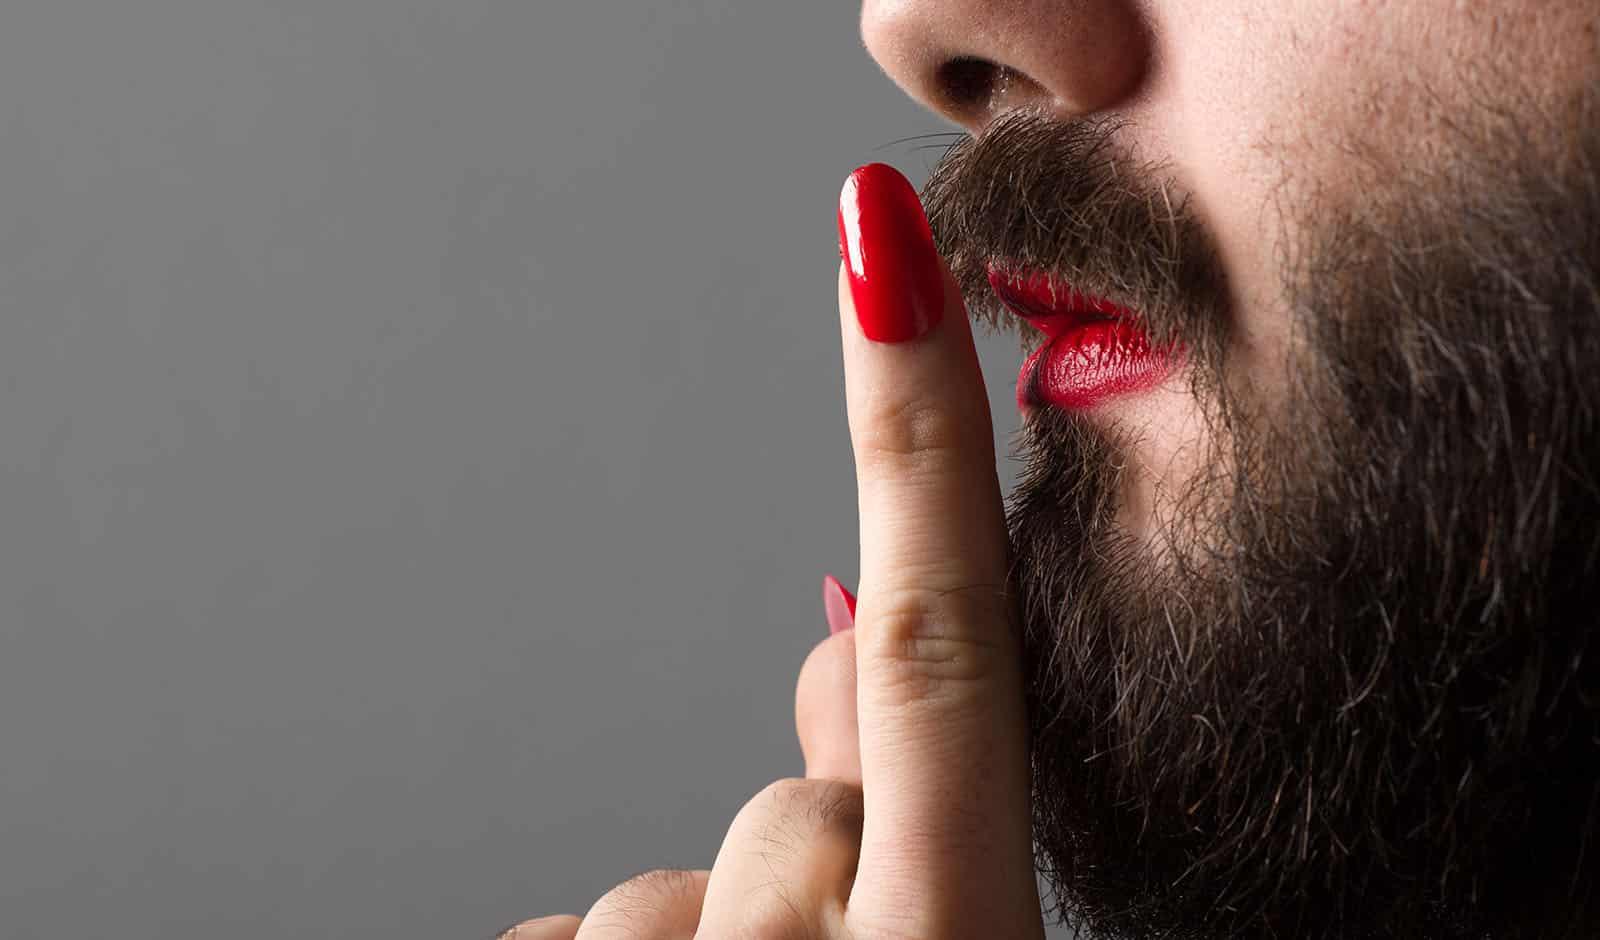 Man with Lipstick and Nail Polish